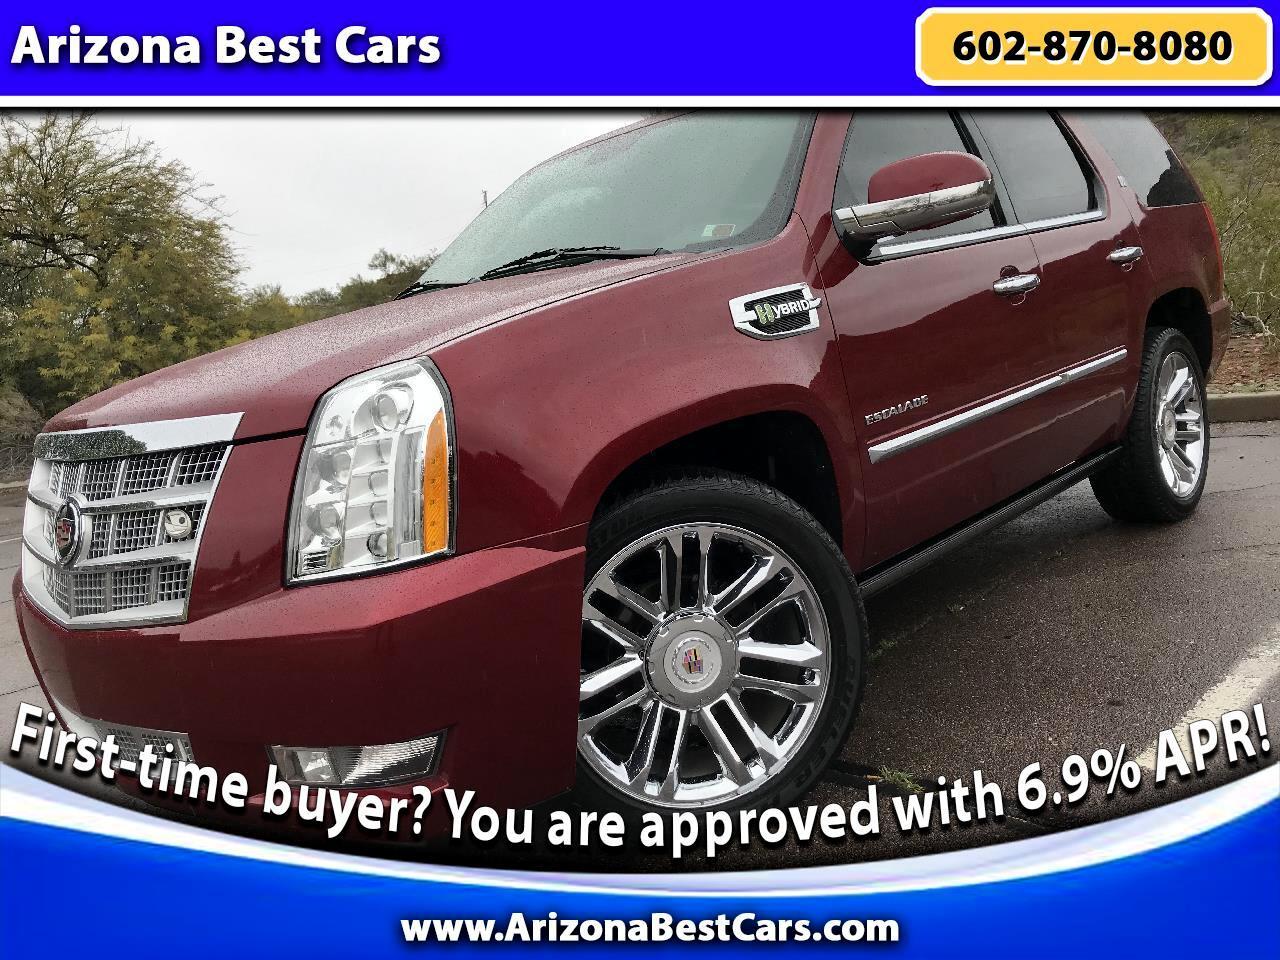 2011 Cadillac Escalade Hybrid 4WD Platinum